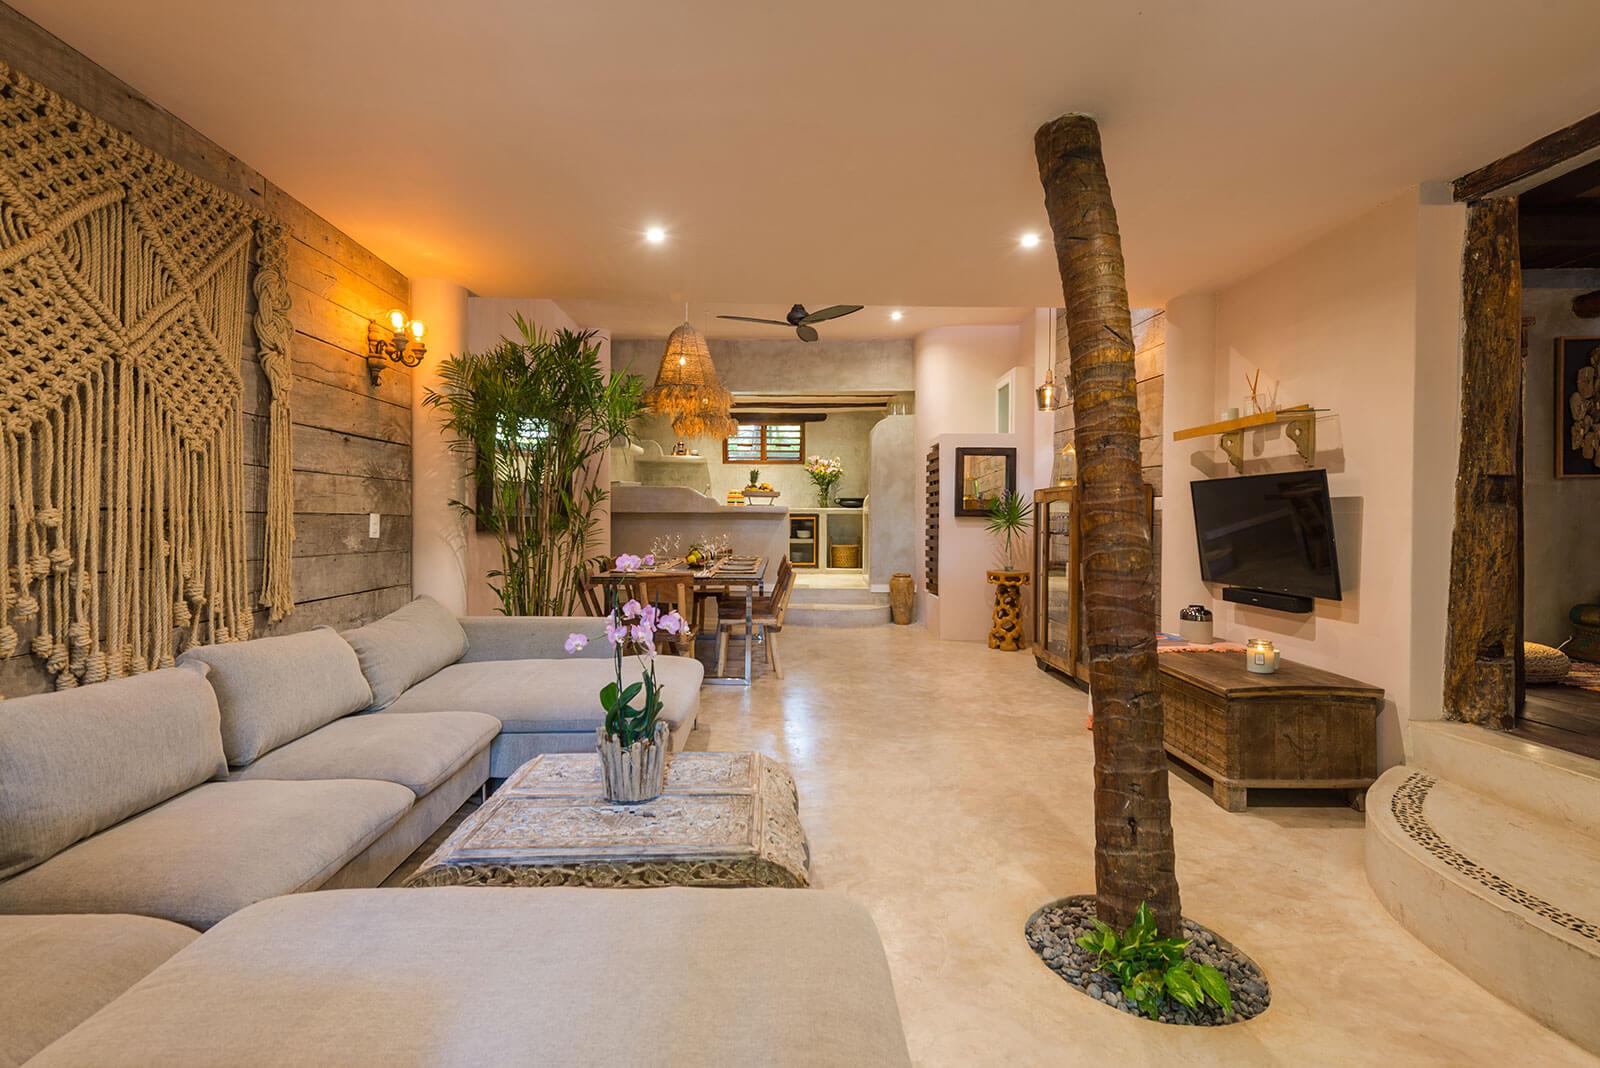 Maya_Luxe_Riviera_Maya_Luxury_Vacations_Villa_Rentals_Tulum_Playa_del_Carmen_Mexico_Bejuco_House_9.jpg